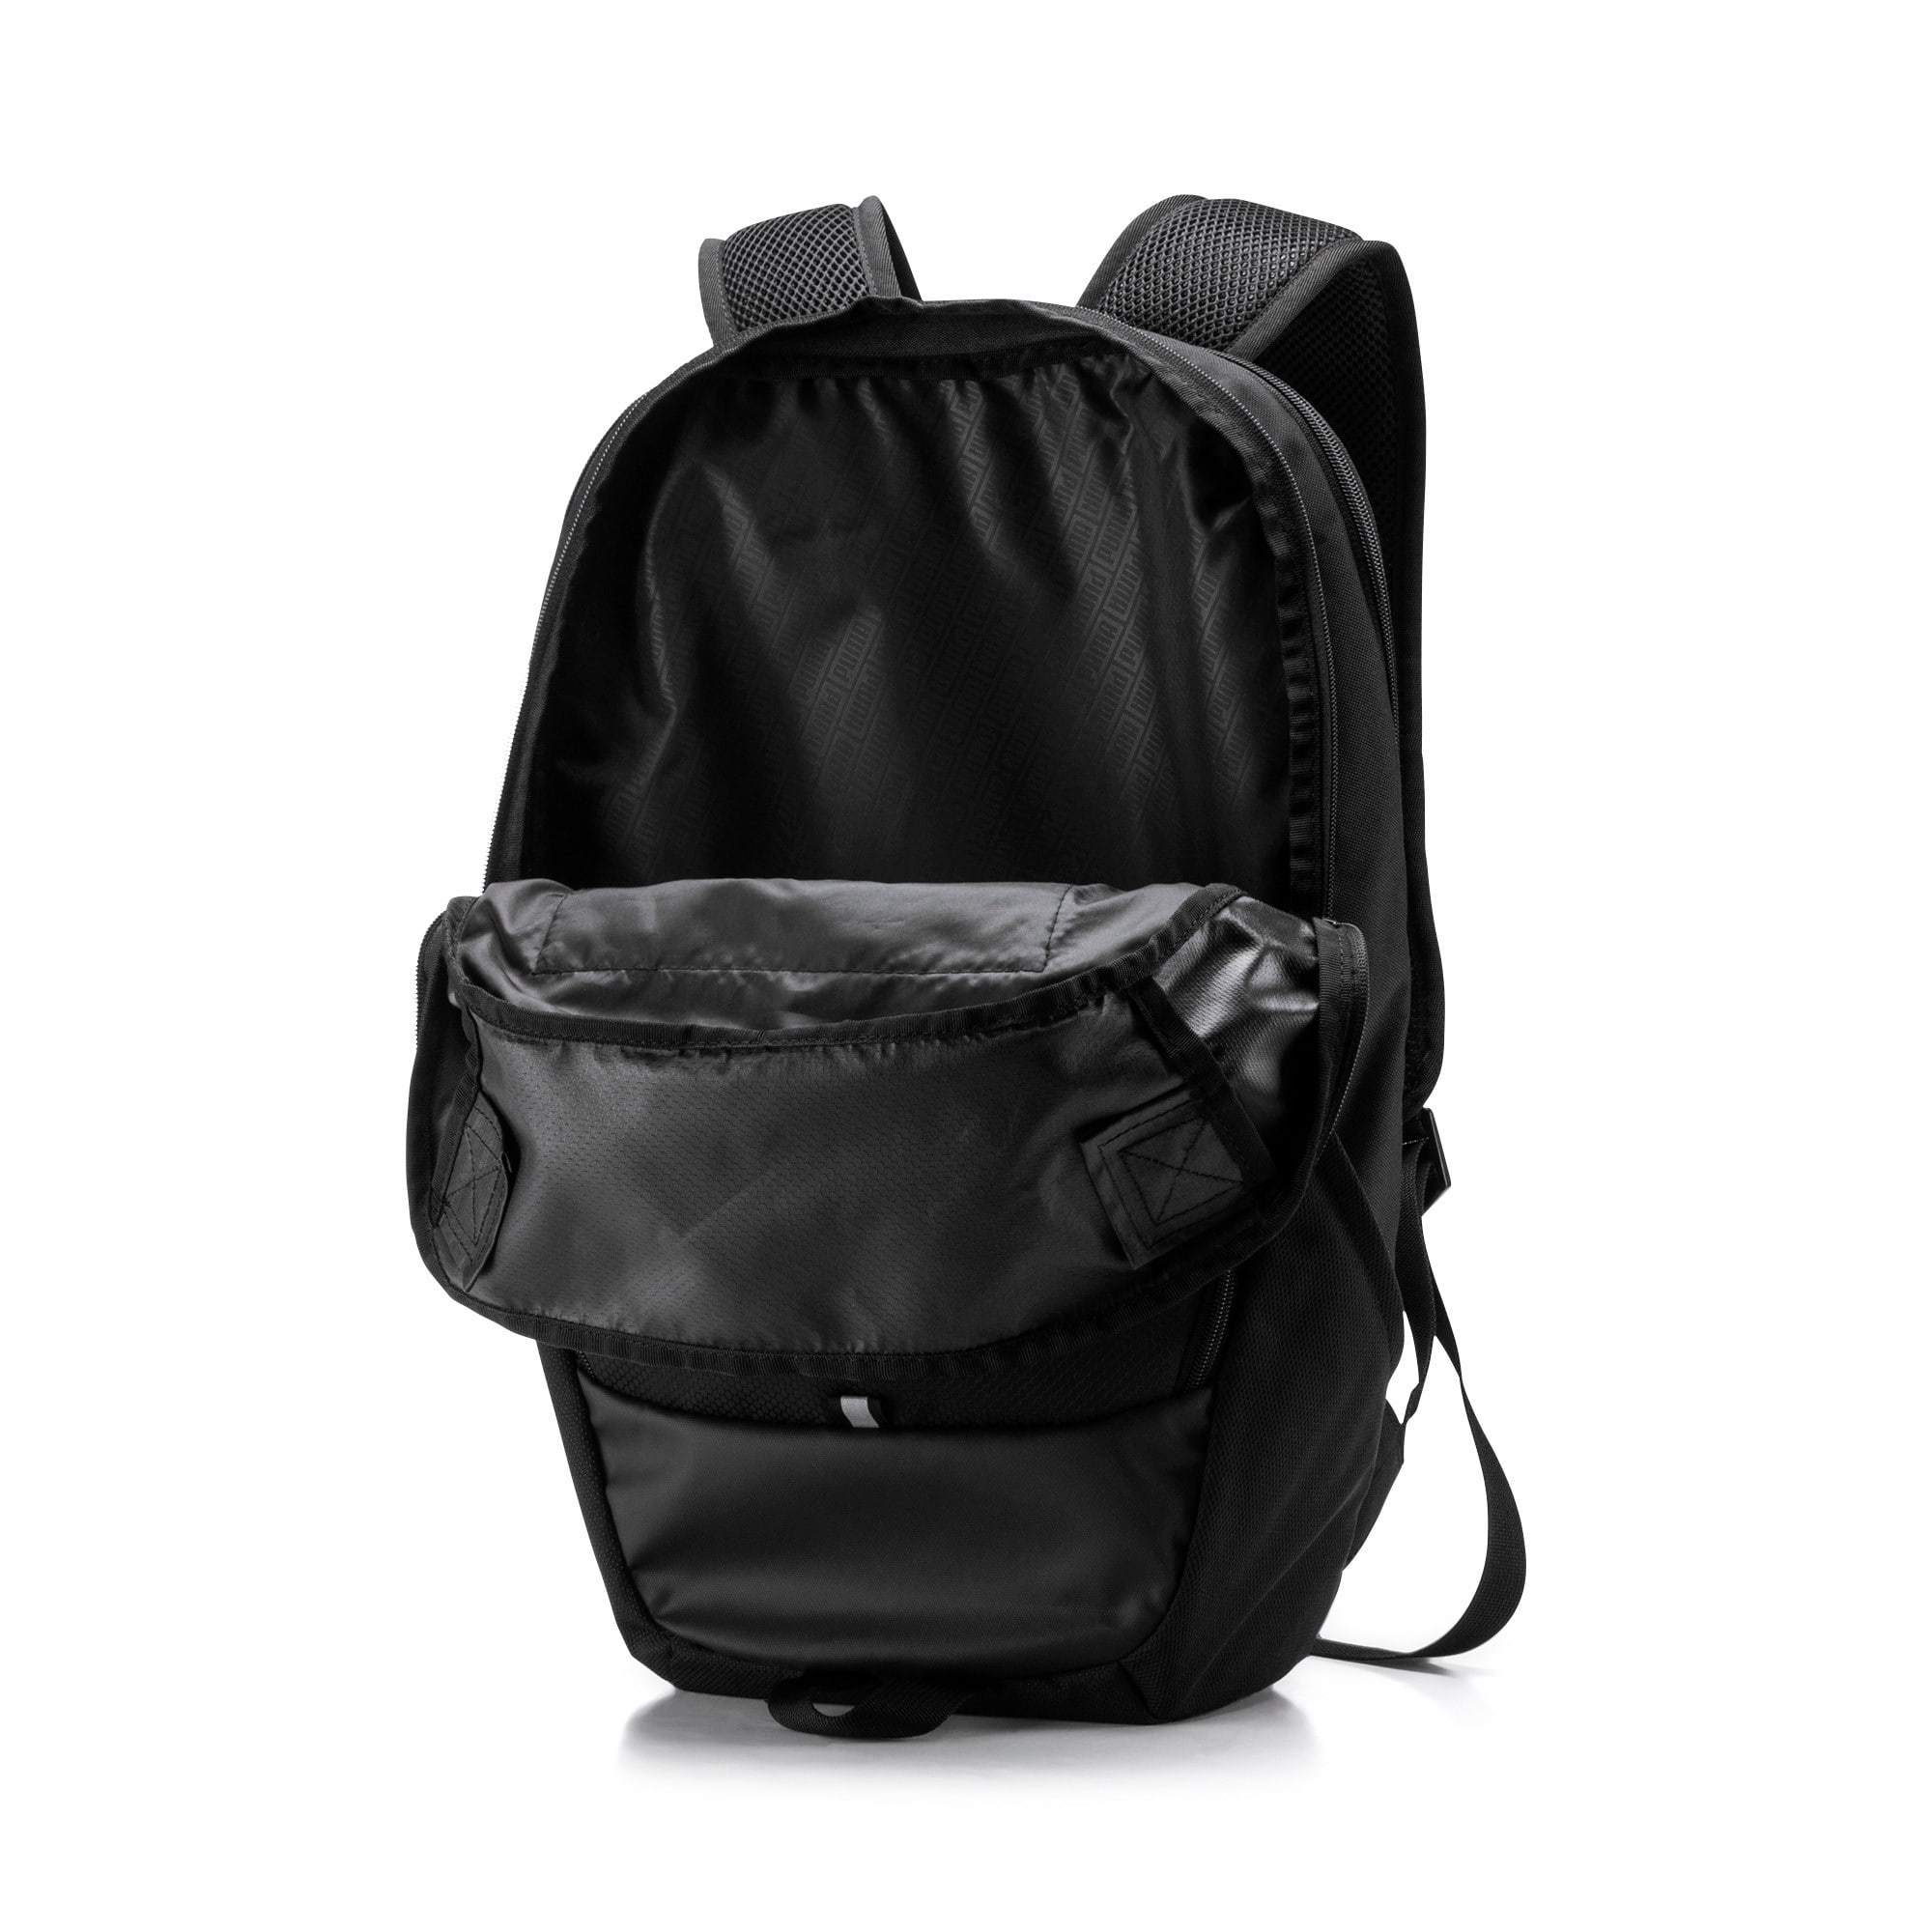 Thumbnail 3 of PUMA X Backpack, Puma Black, medium